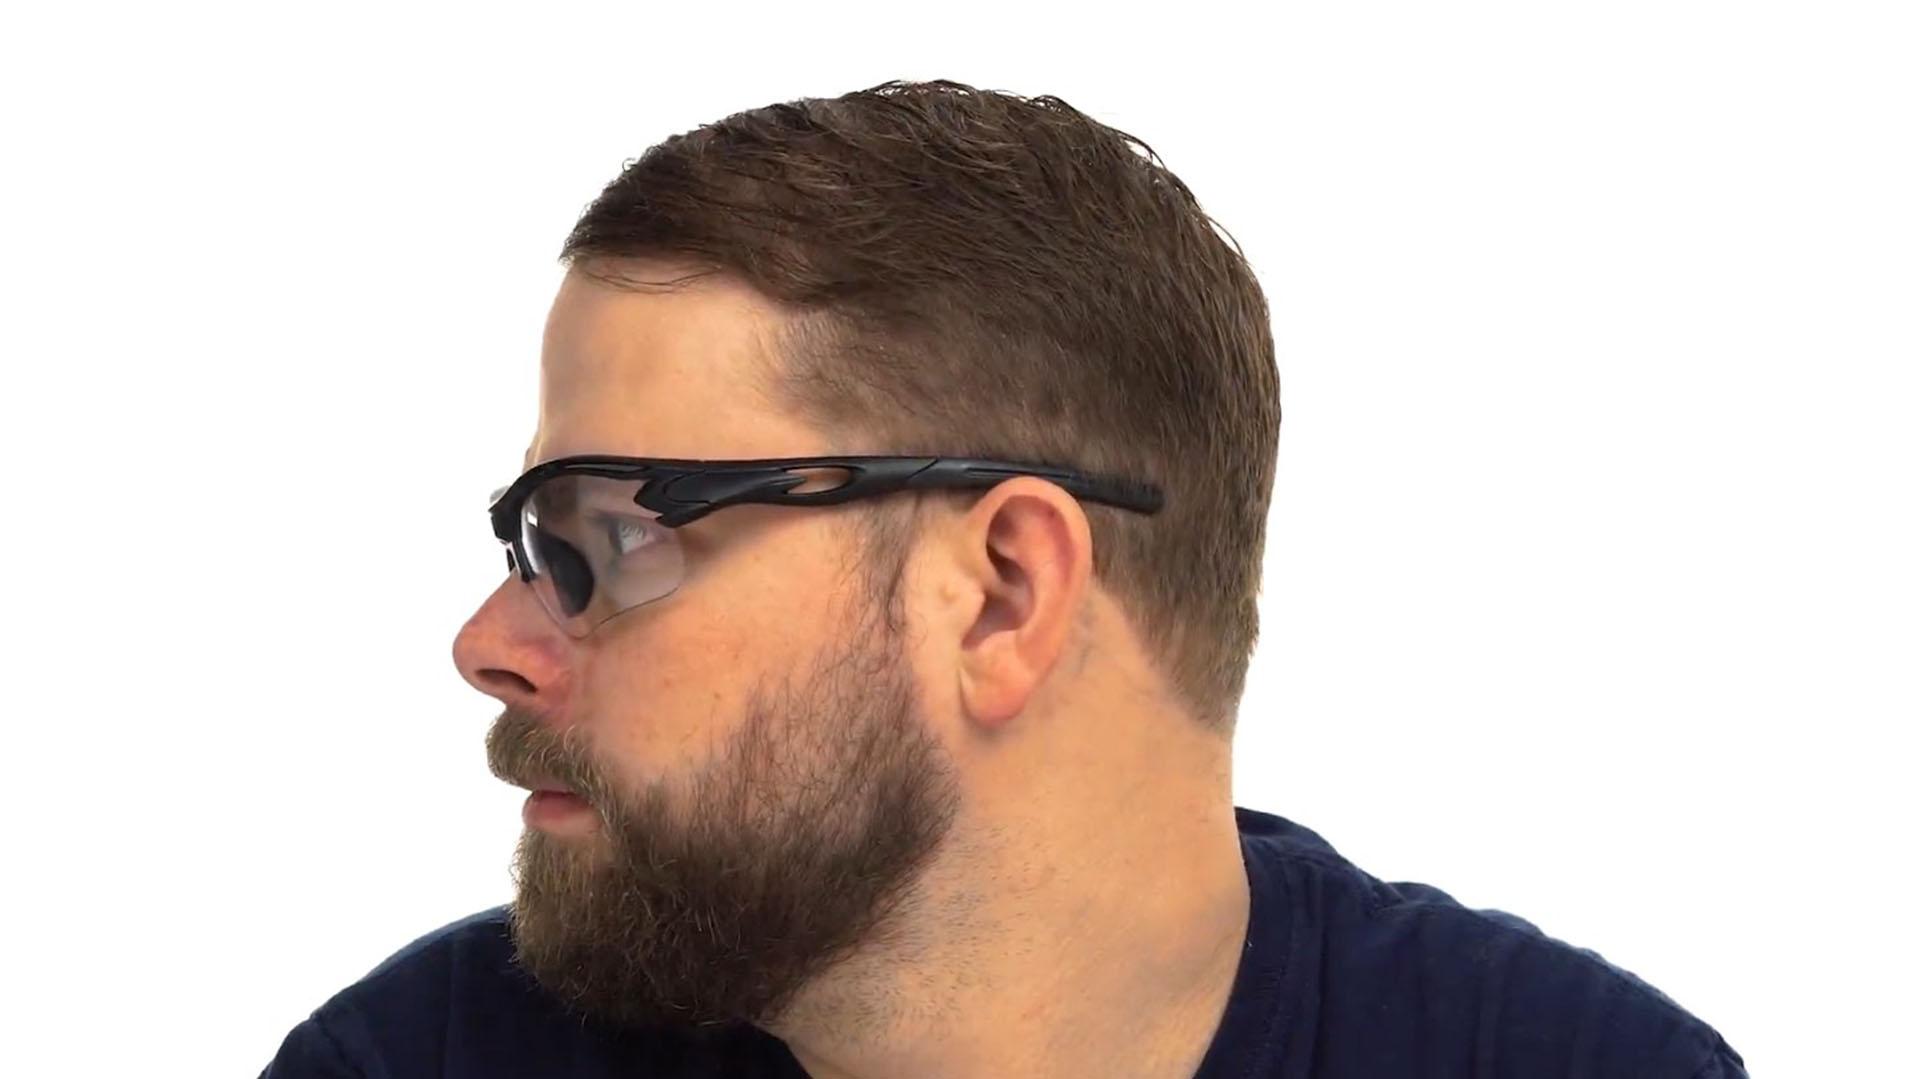 Matrix Bayshore Prescription Safety Glasses - ANSI Z87.1